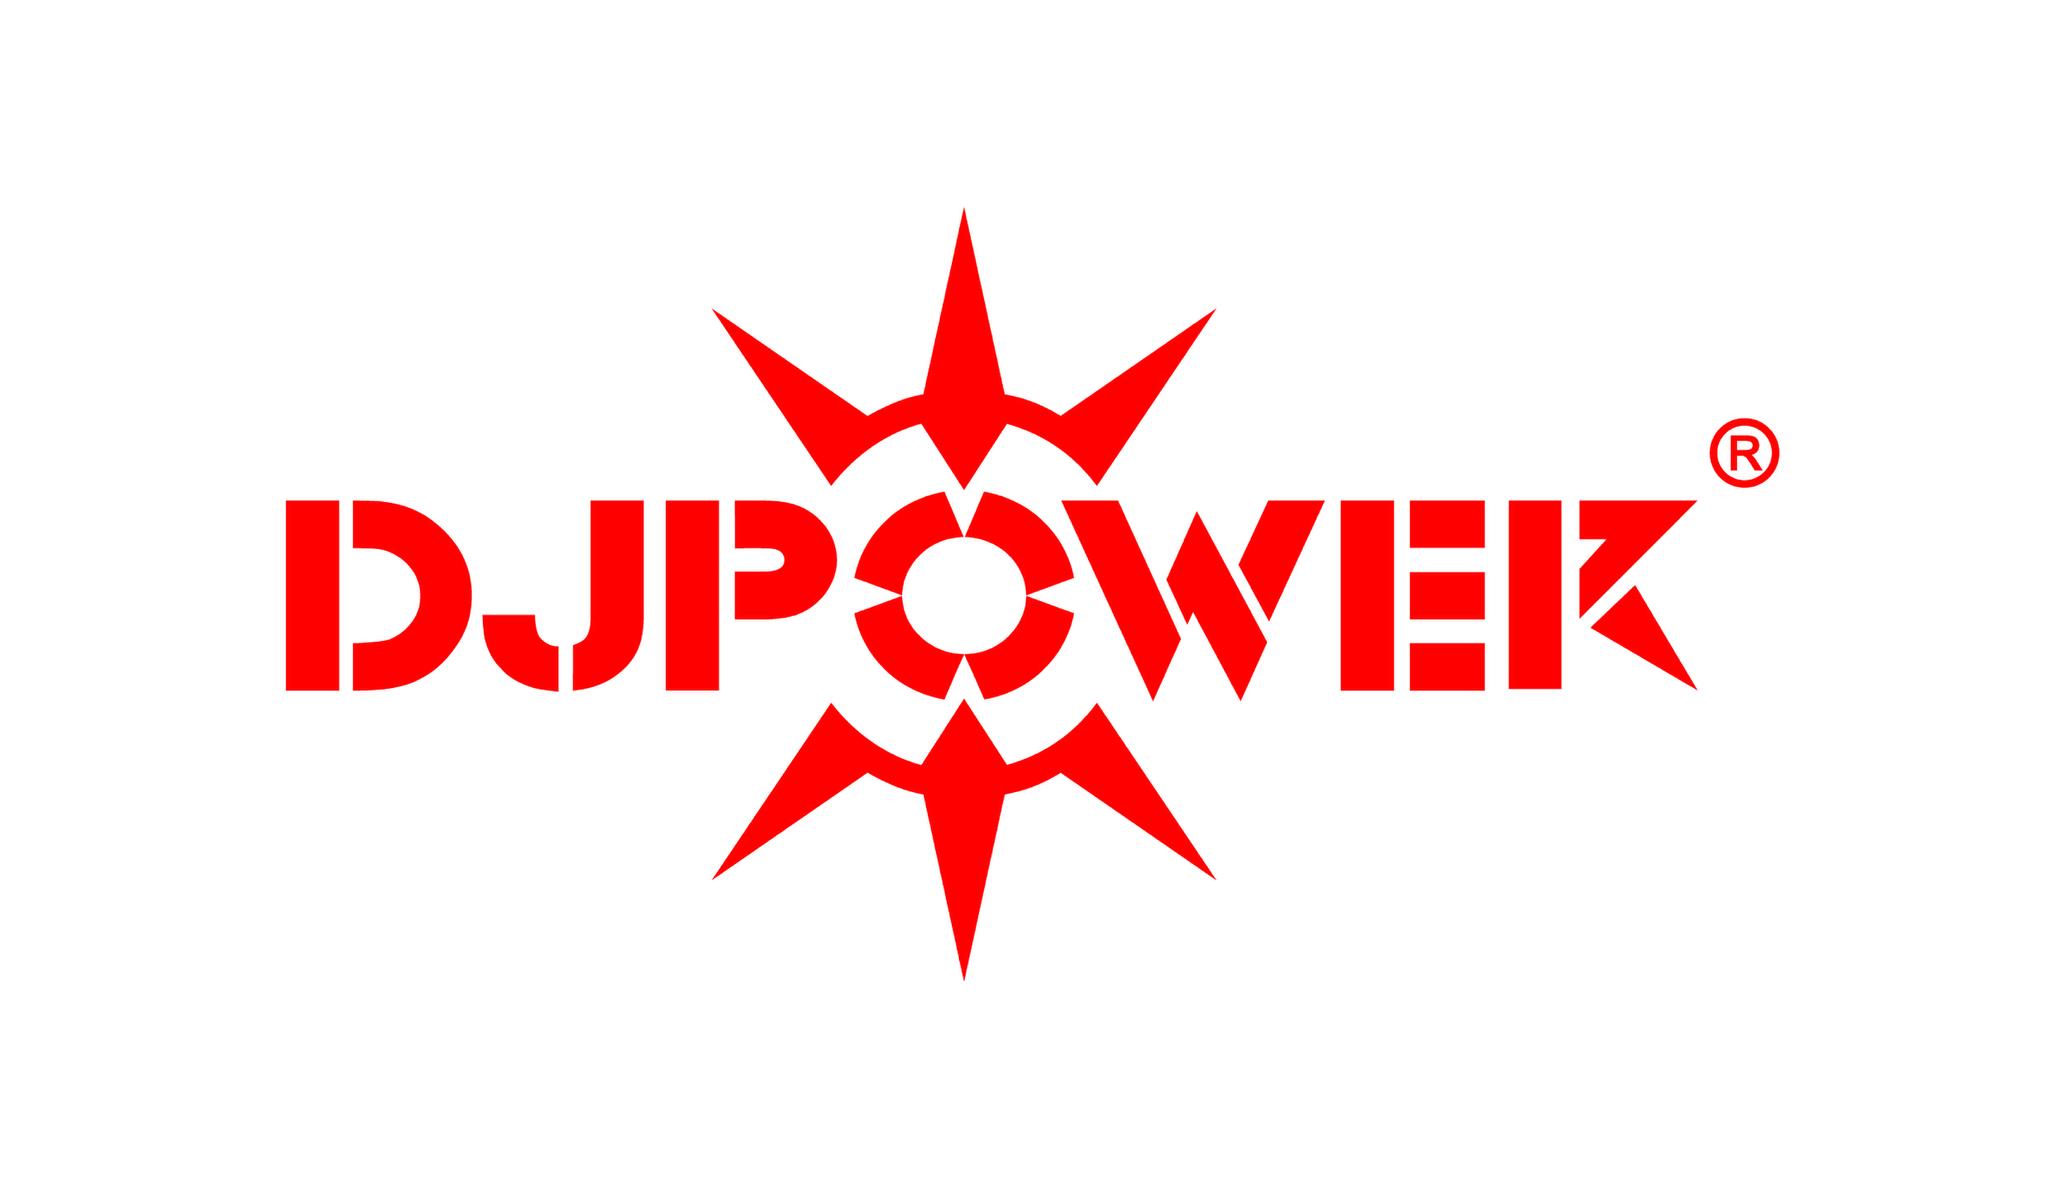 DJ power